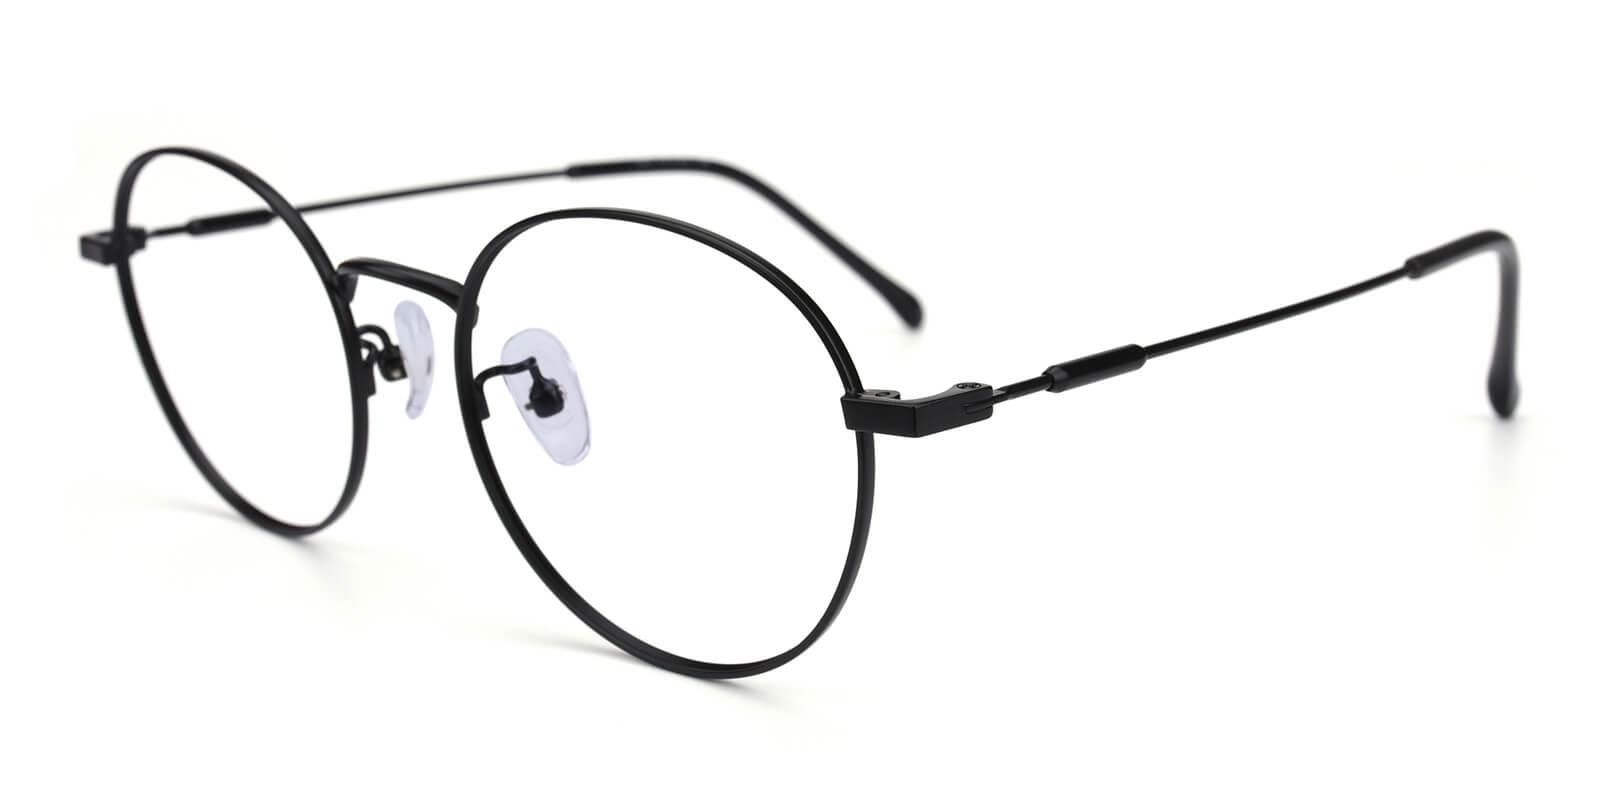 Hibbardr-Black-Round-Metal-Eyeglasses-additional1